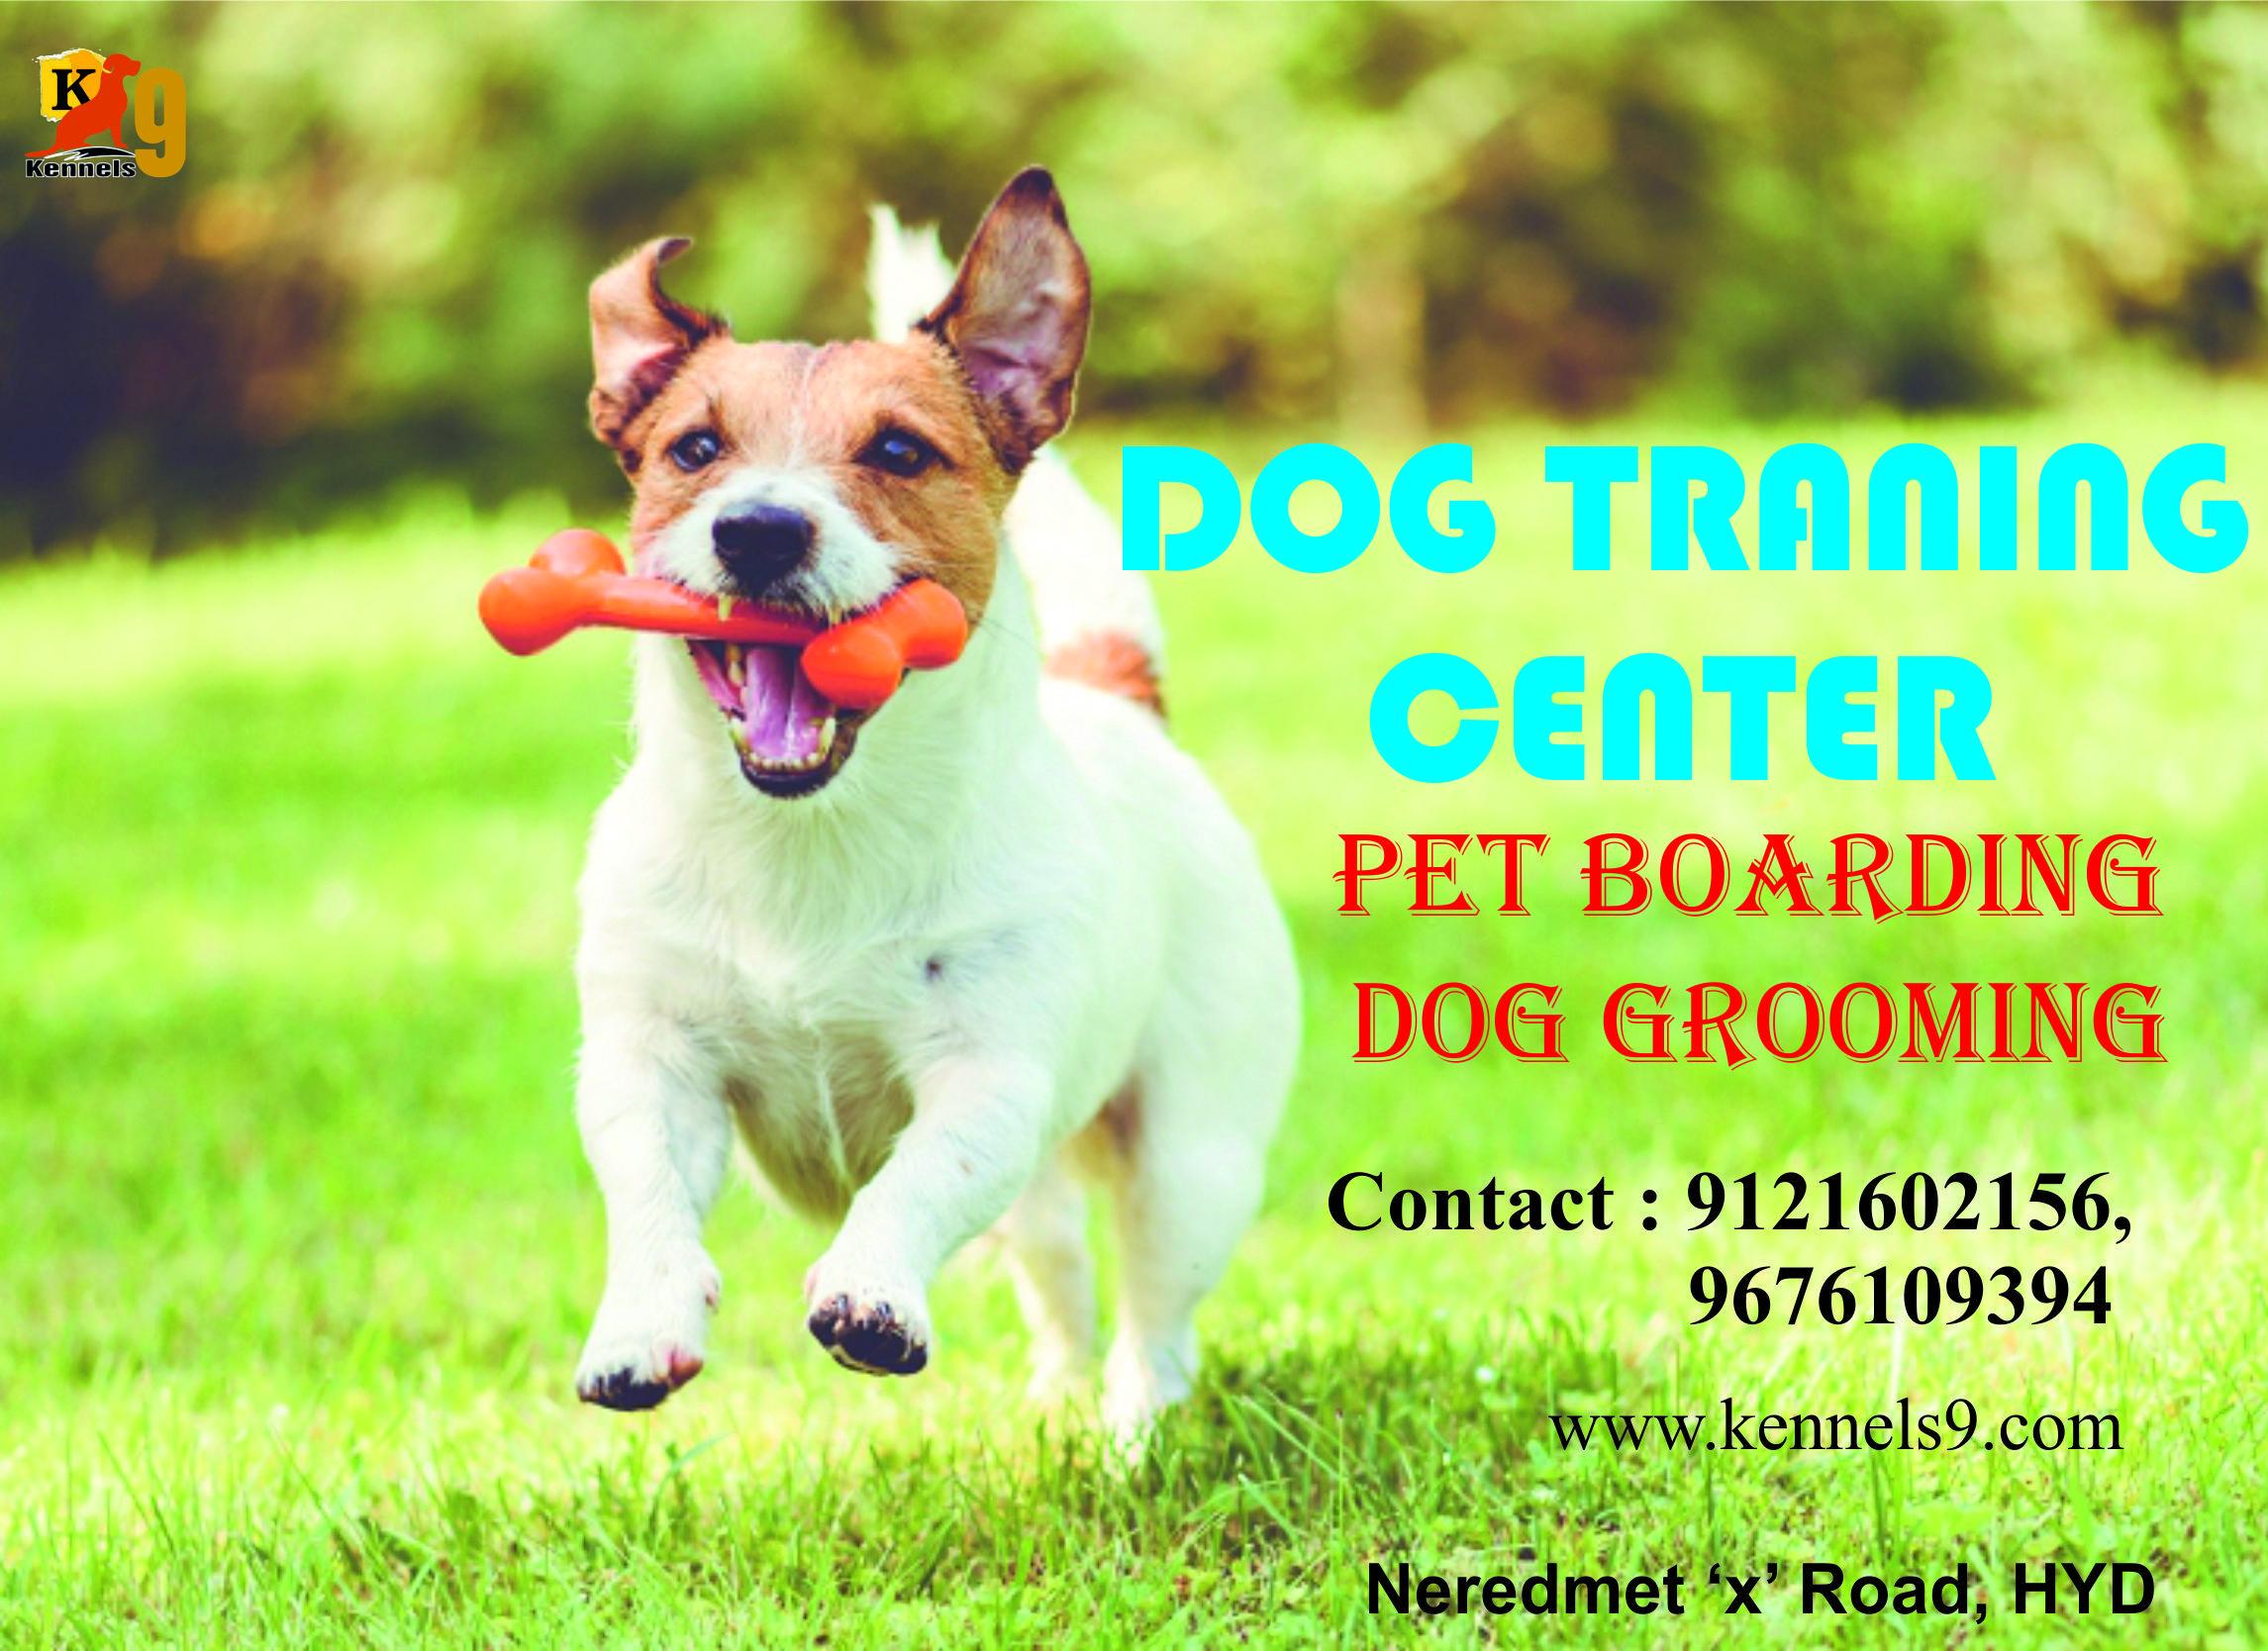 Dog training center is services in Sainikpuri